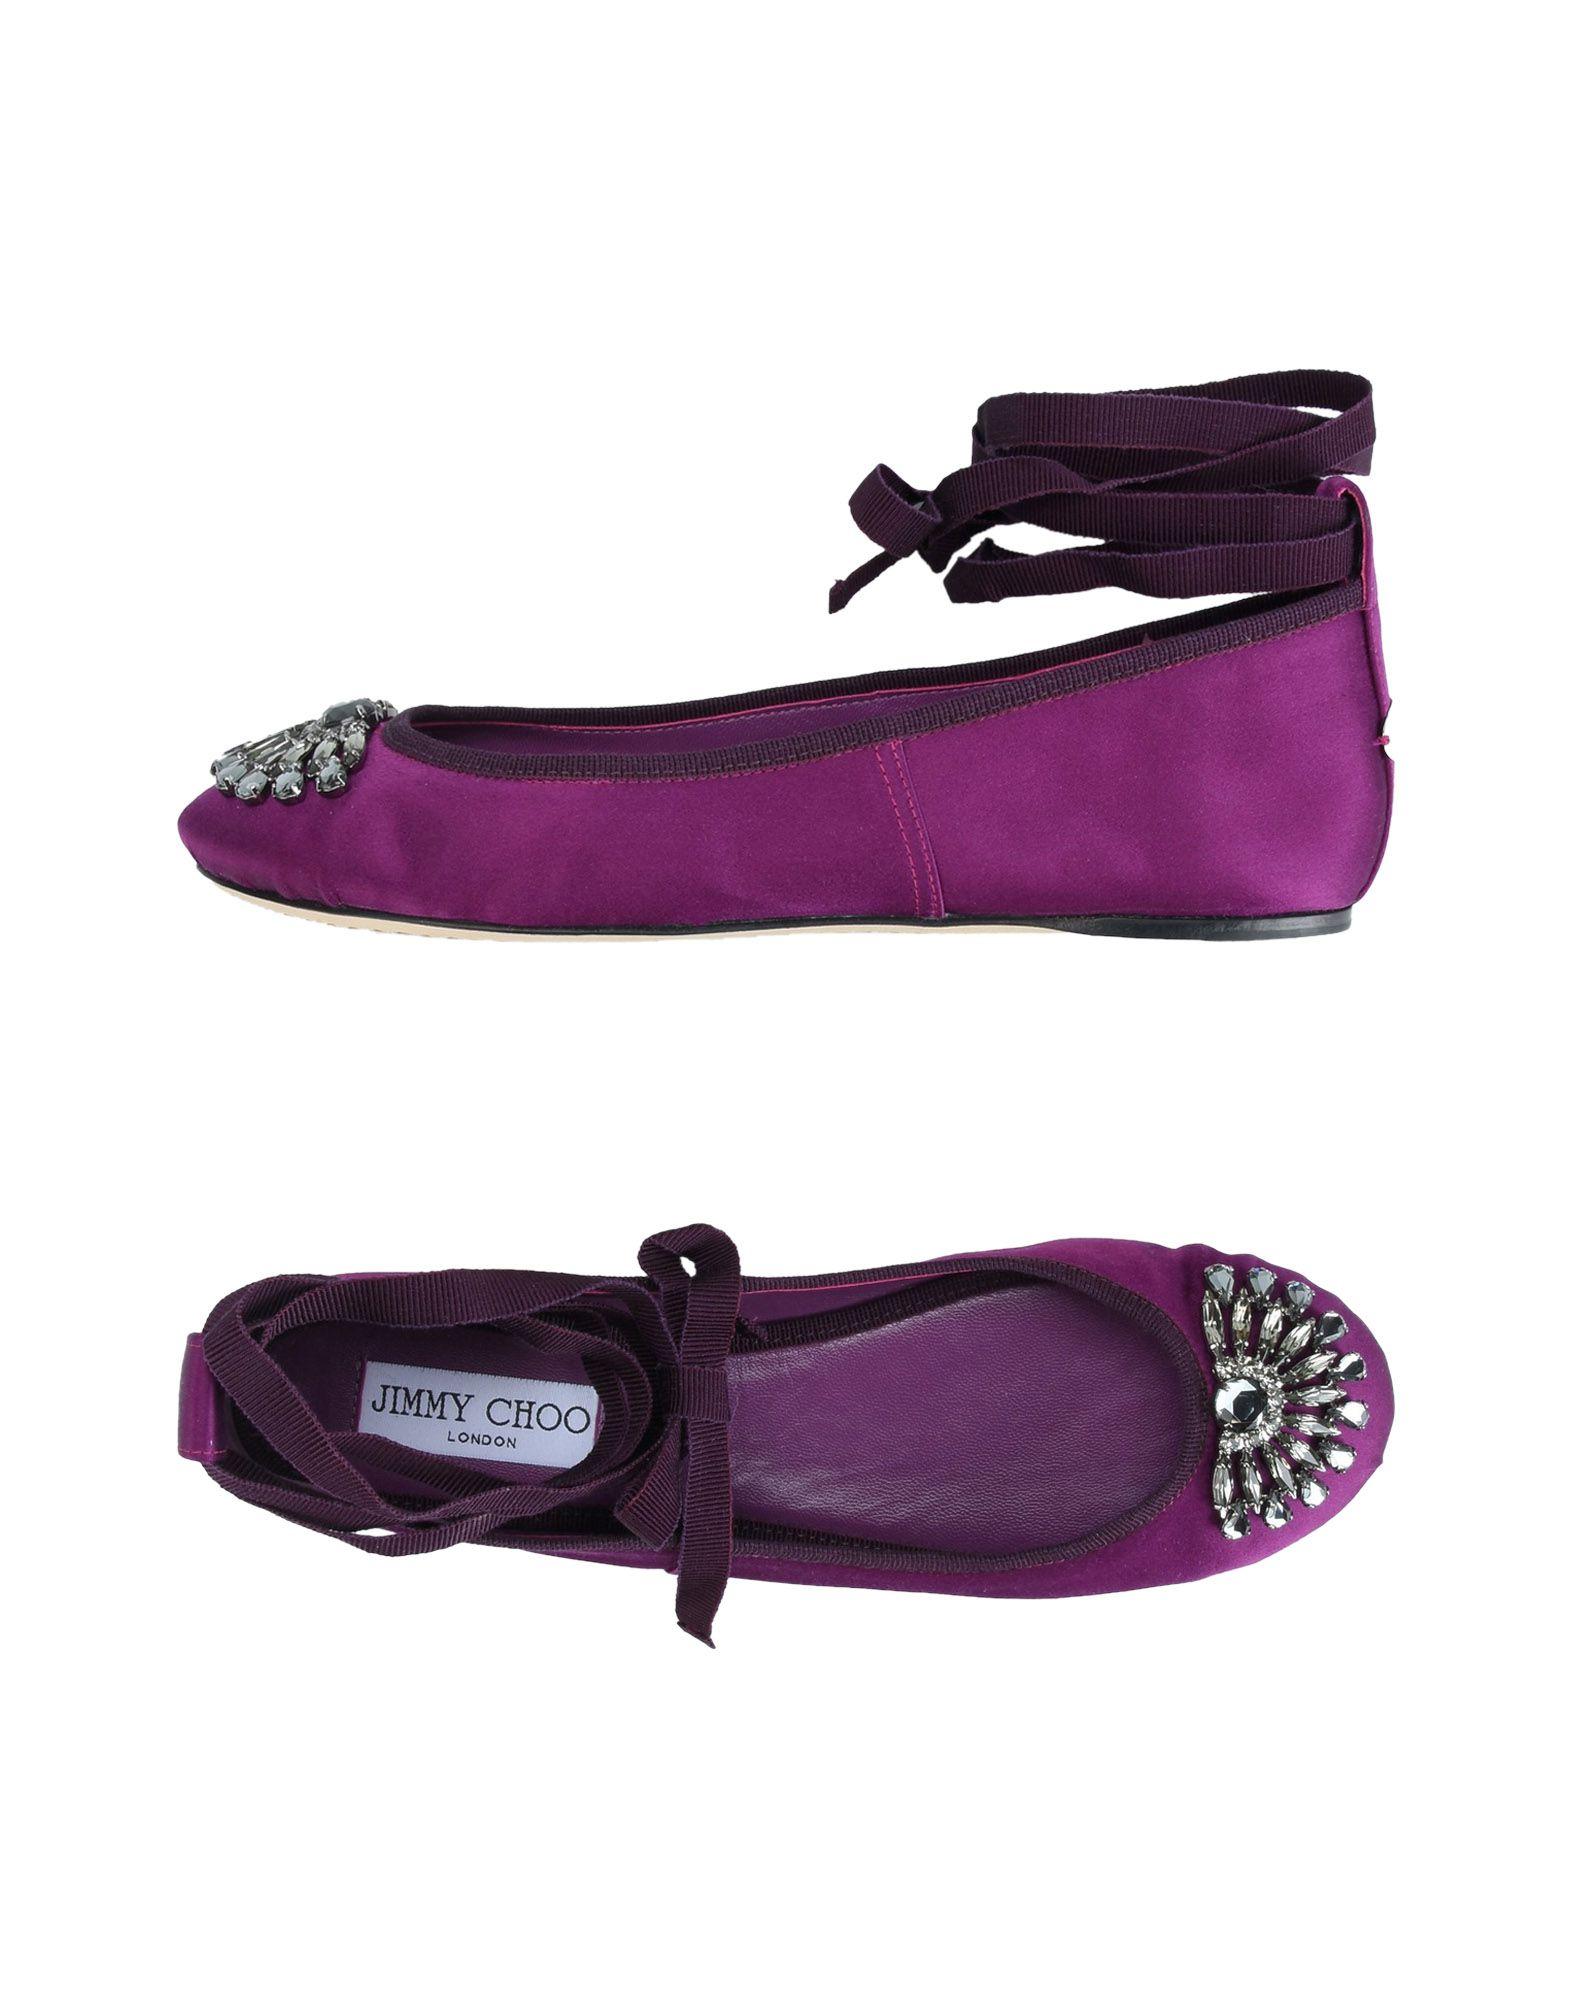 Rabatt Schuhe Jimmy Choo Ballerinas Damen  11397664VE